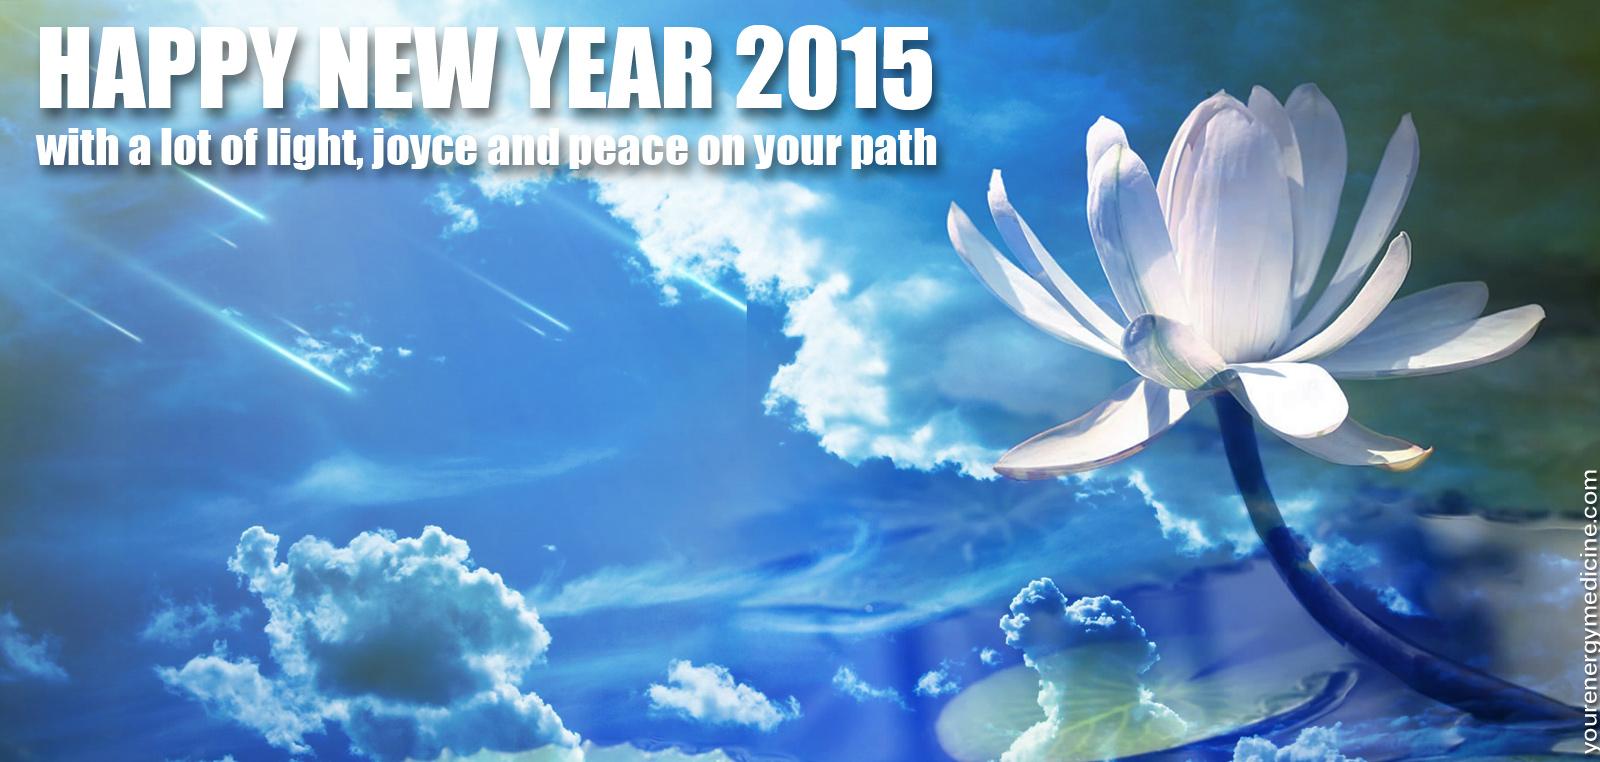 Happy new year 2015 yourenergymedicine blog shamanismquotesenergymedicine izmirmasajfo